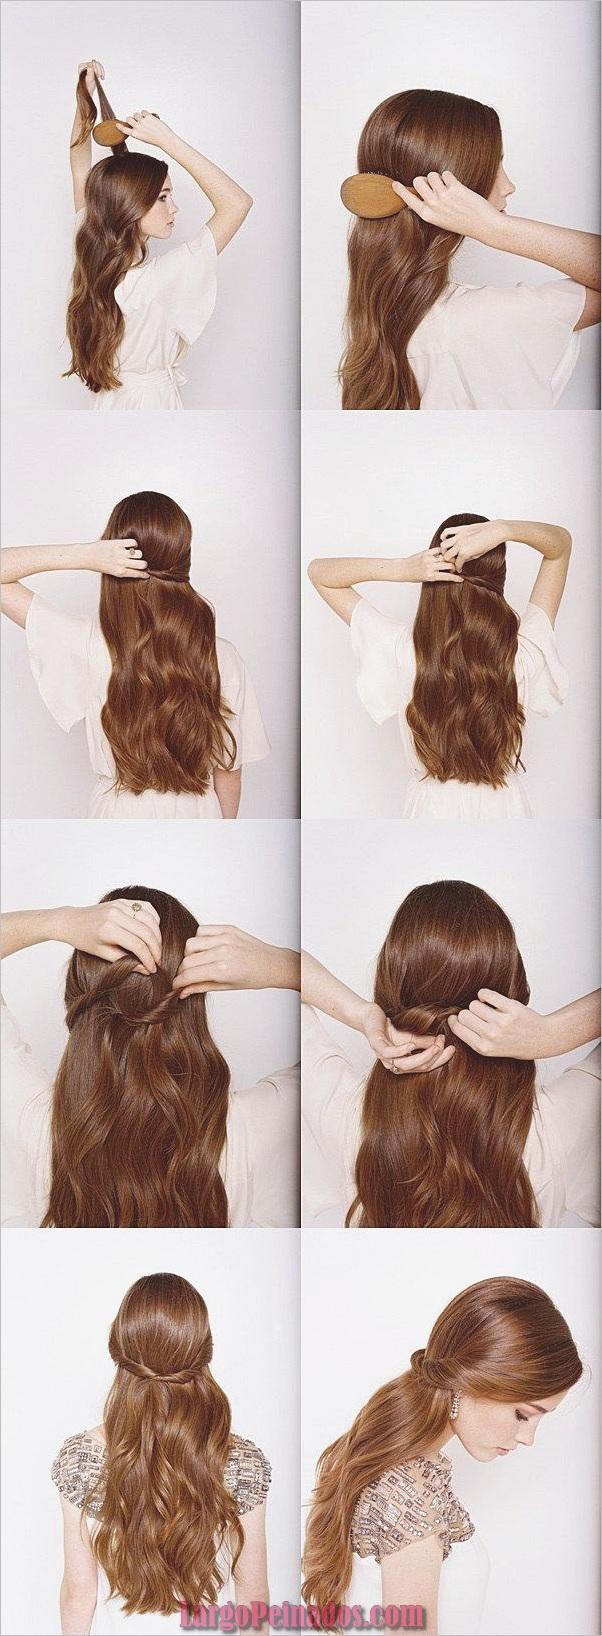 Peinados simples de cinco minutos (12)